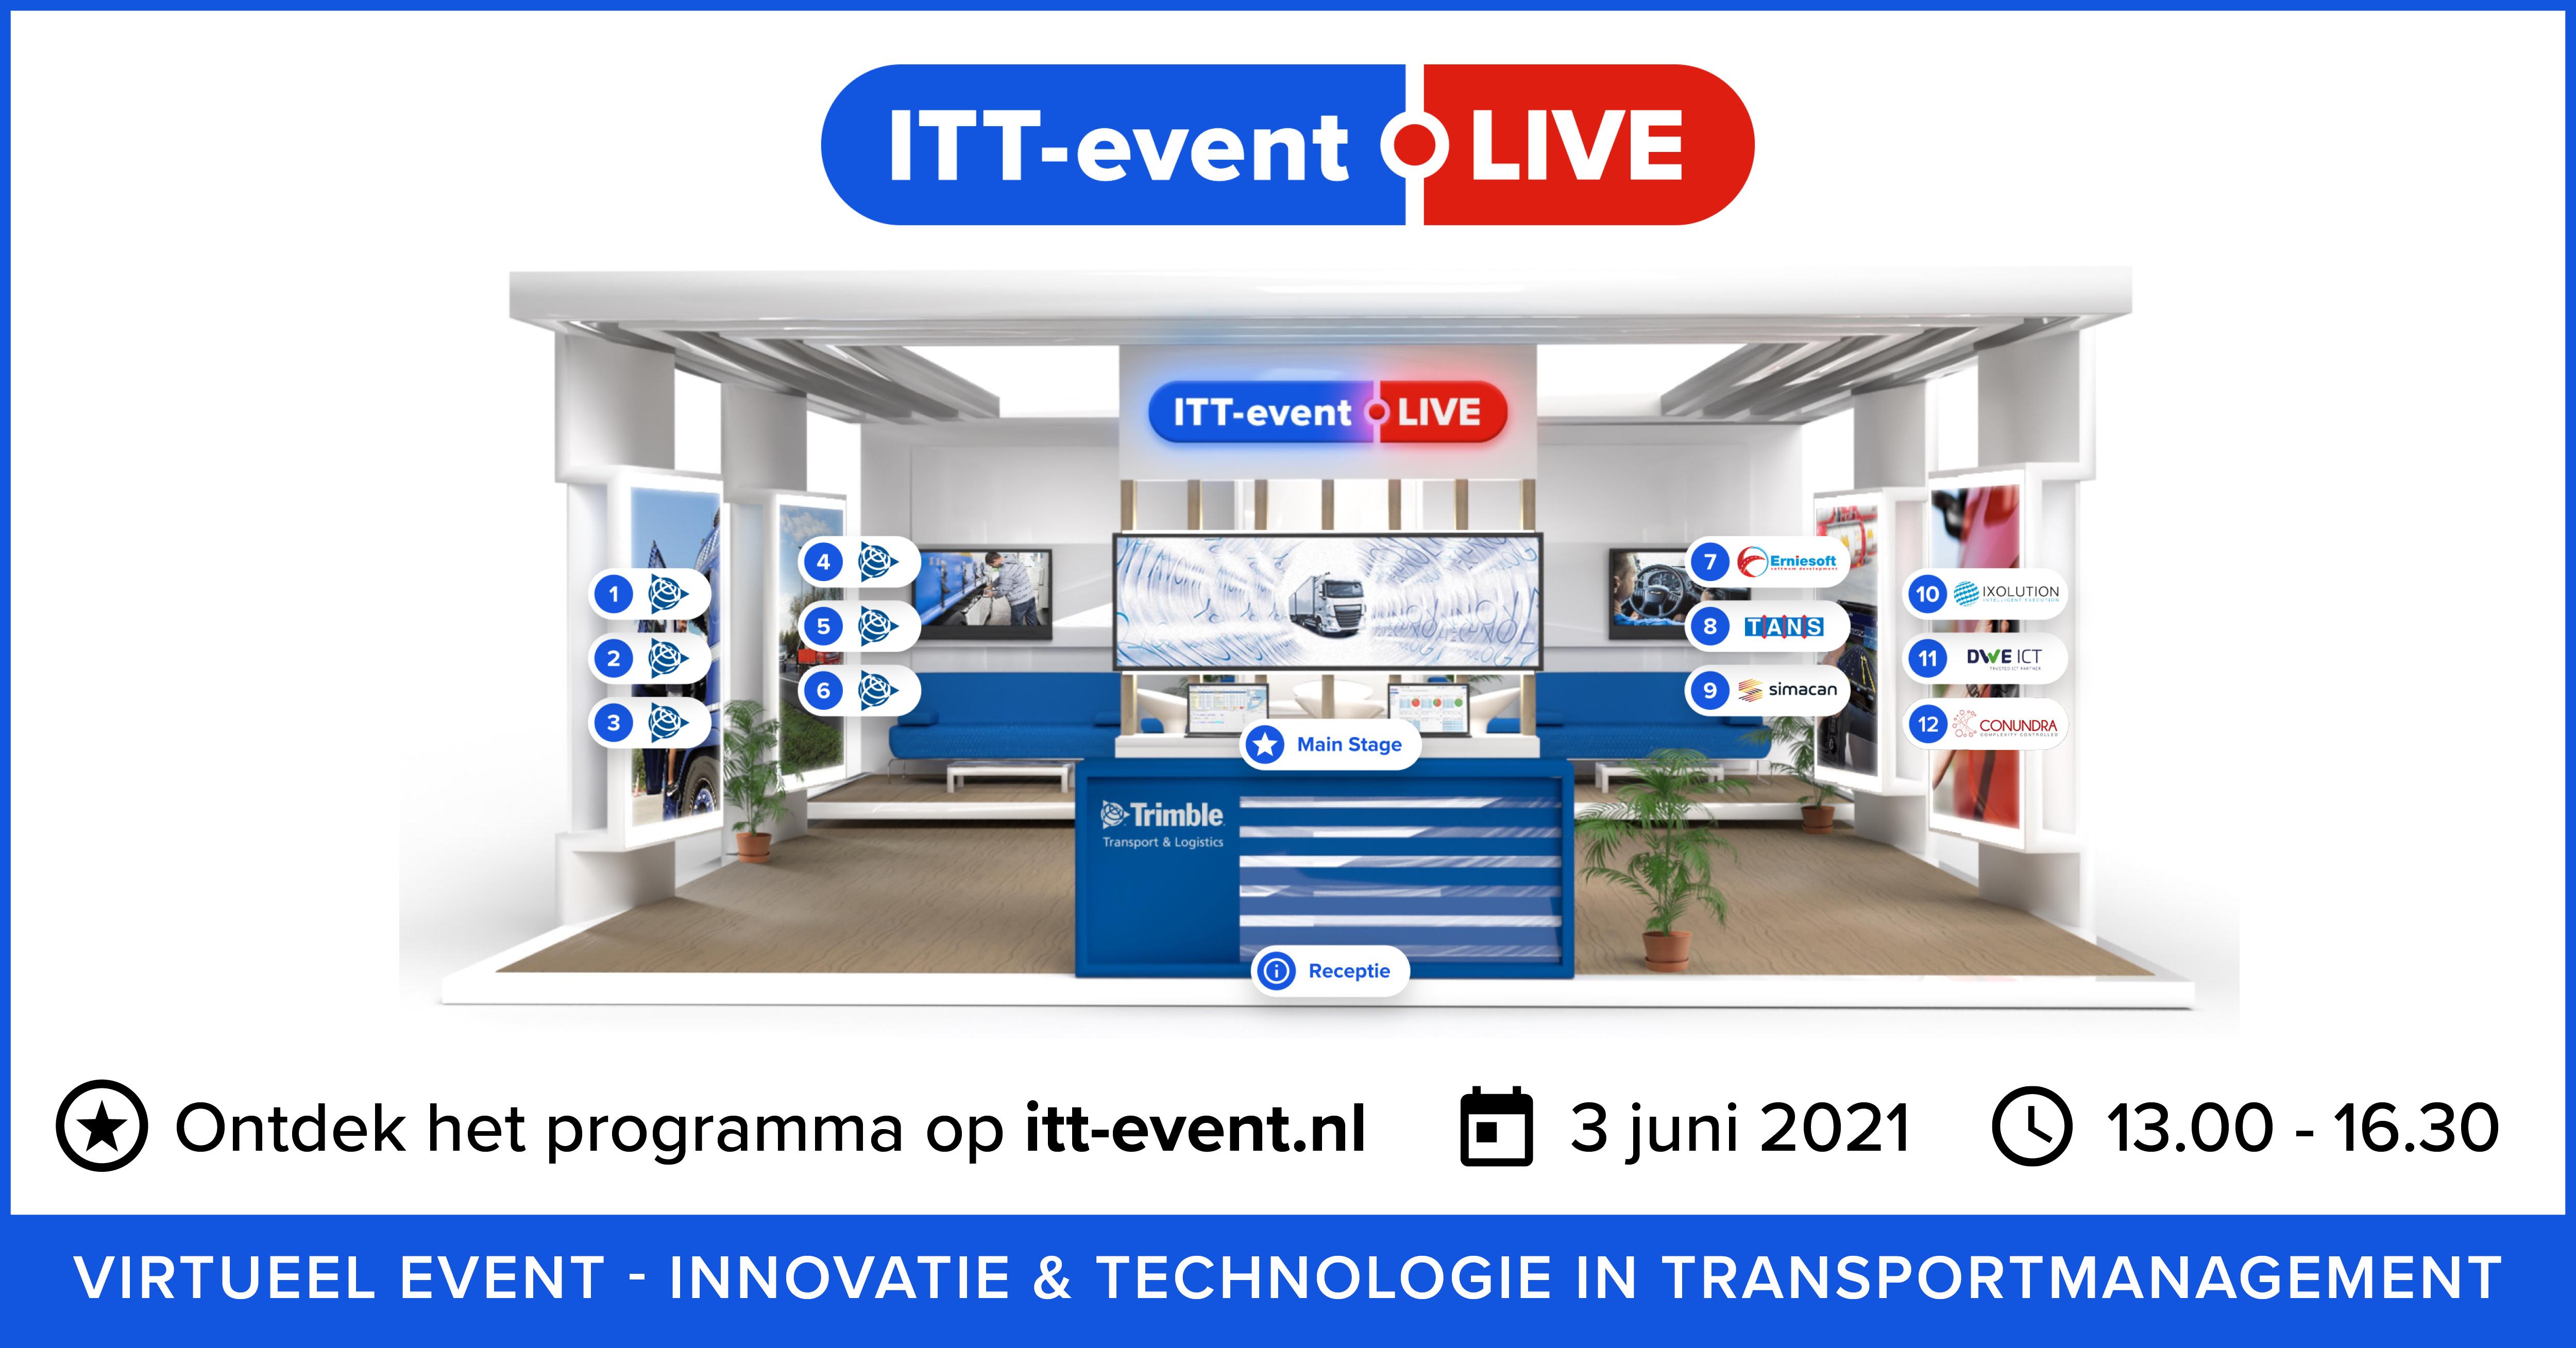 NL ITT-event 2021 - Social banner